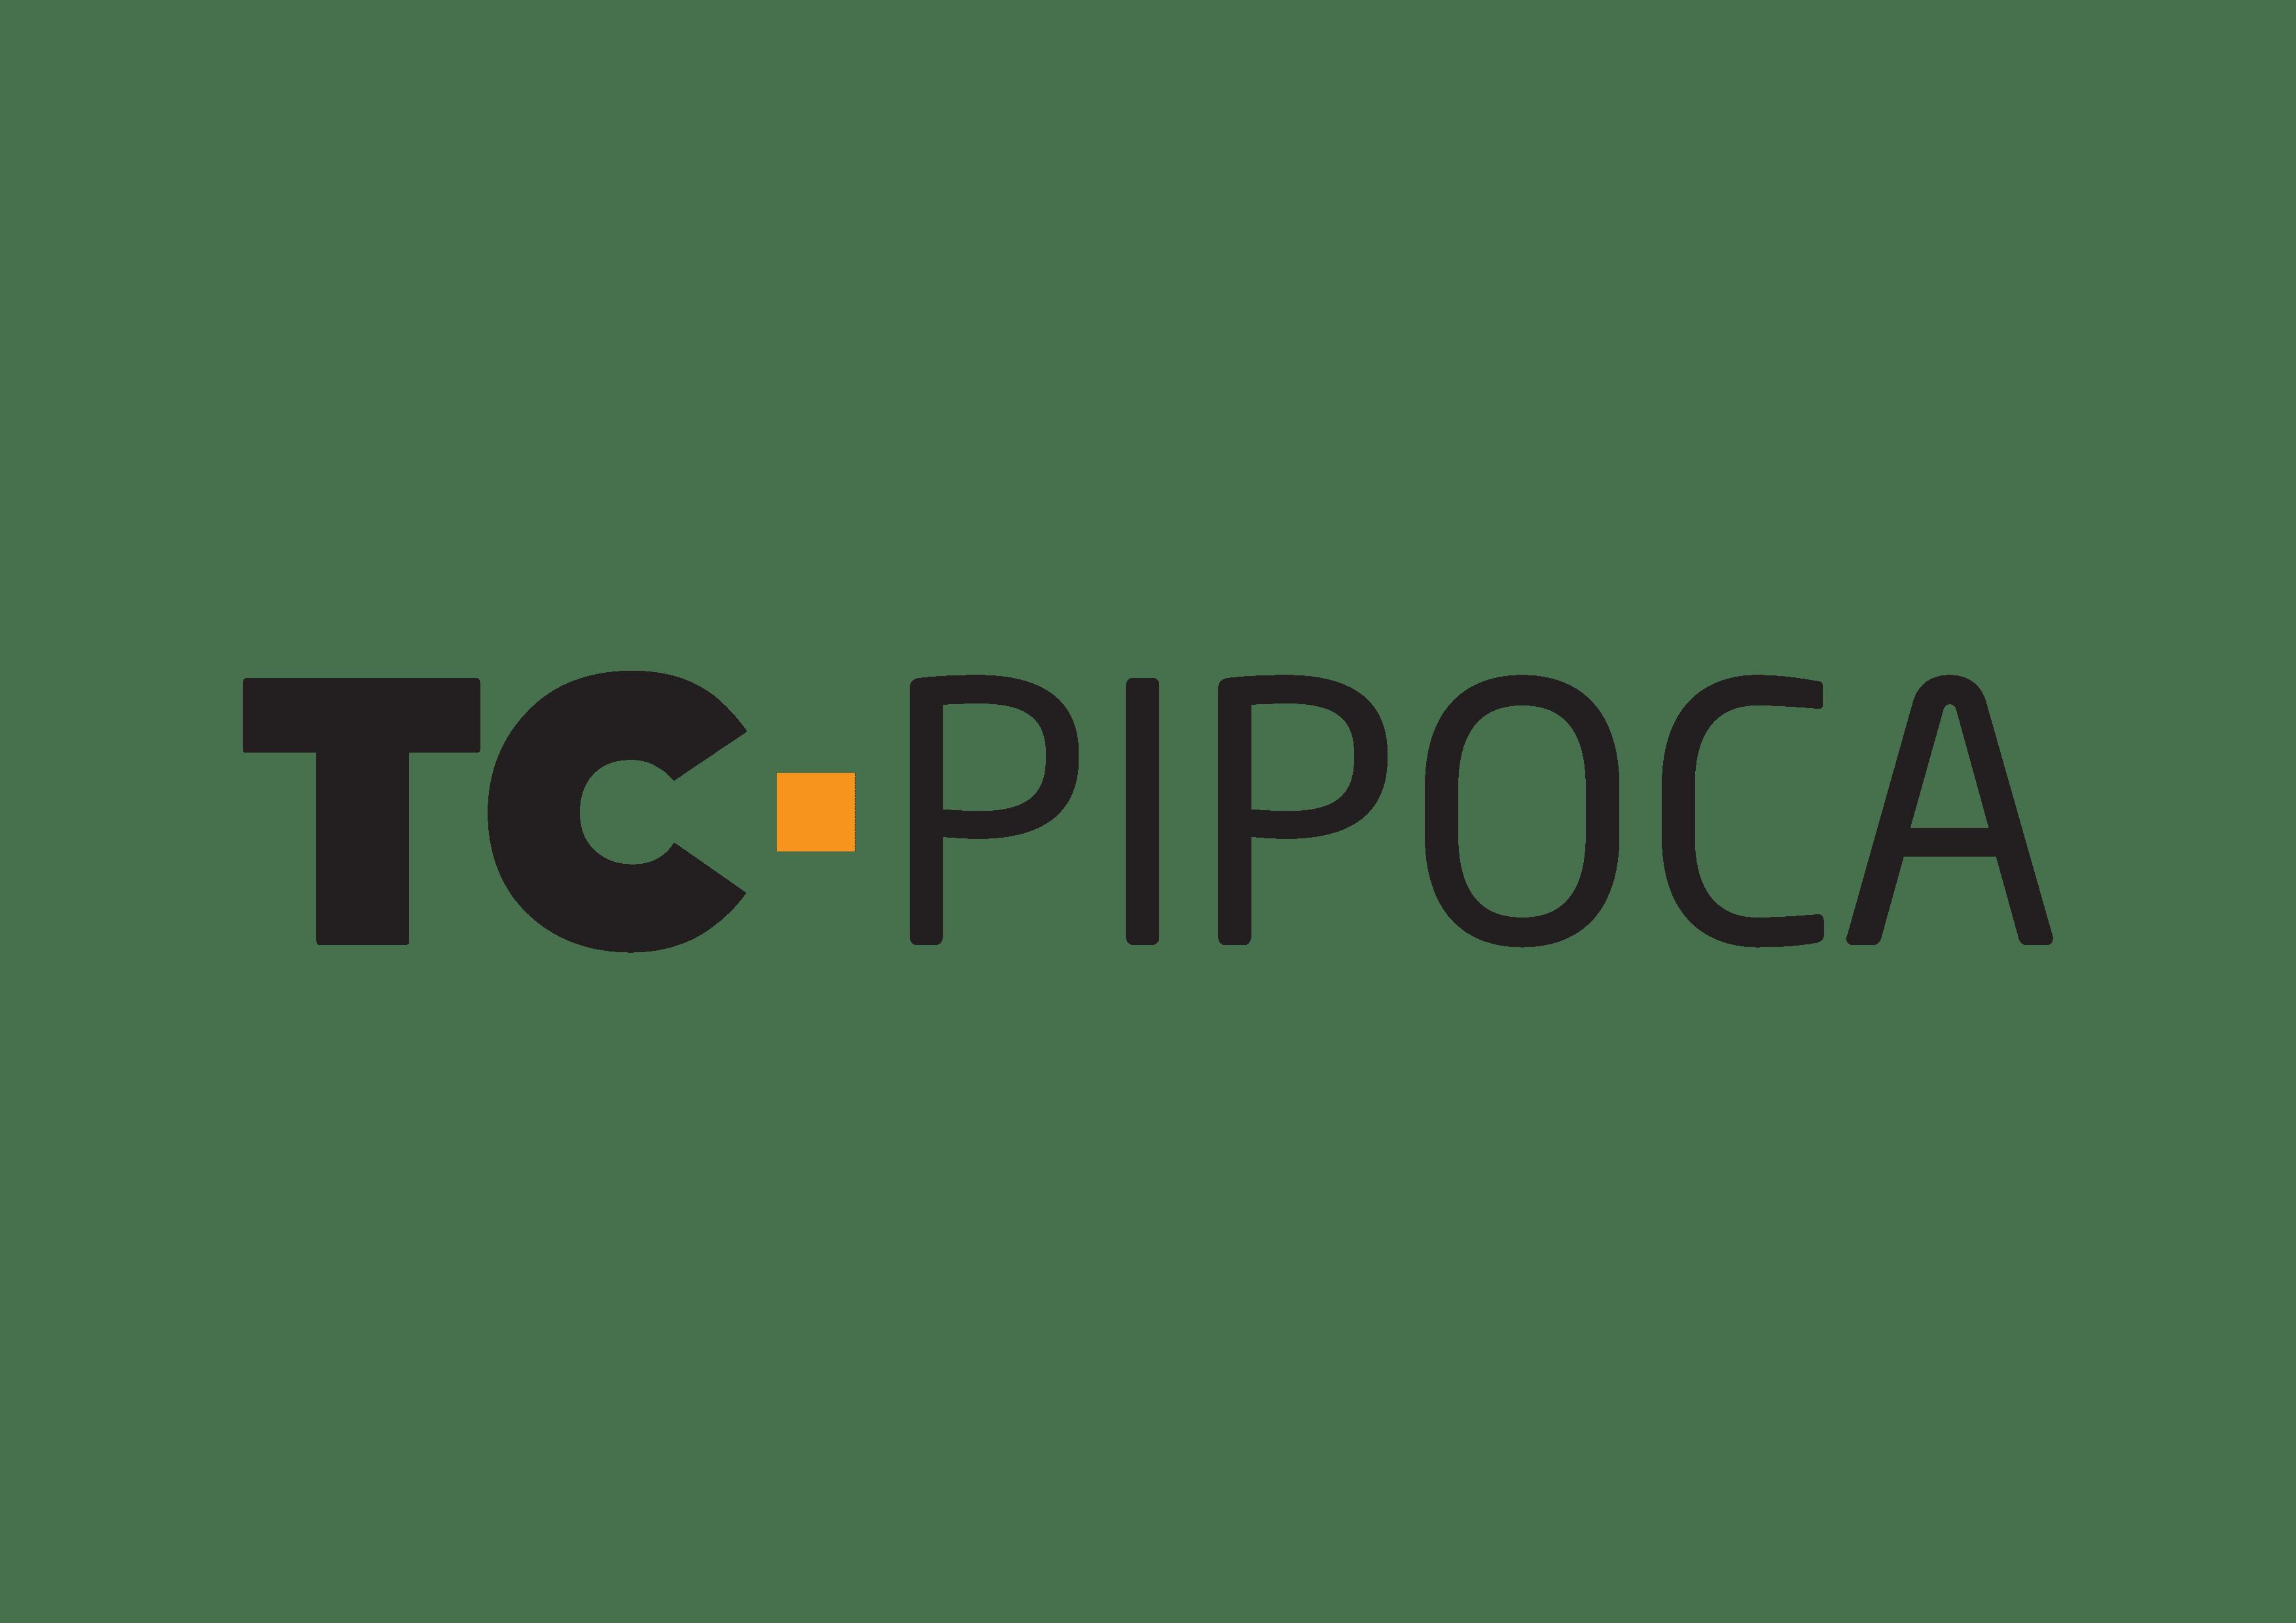 Telecine Pipoca